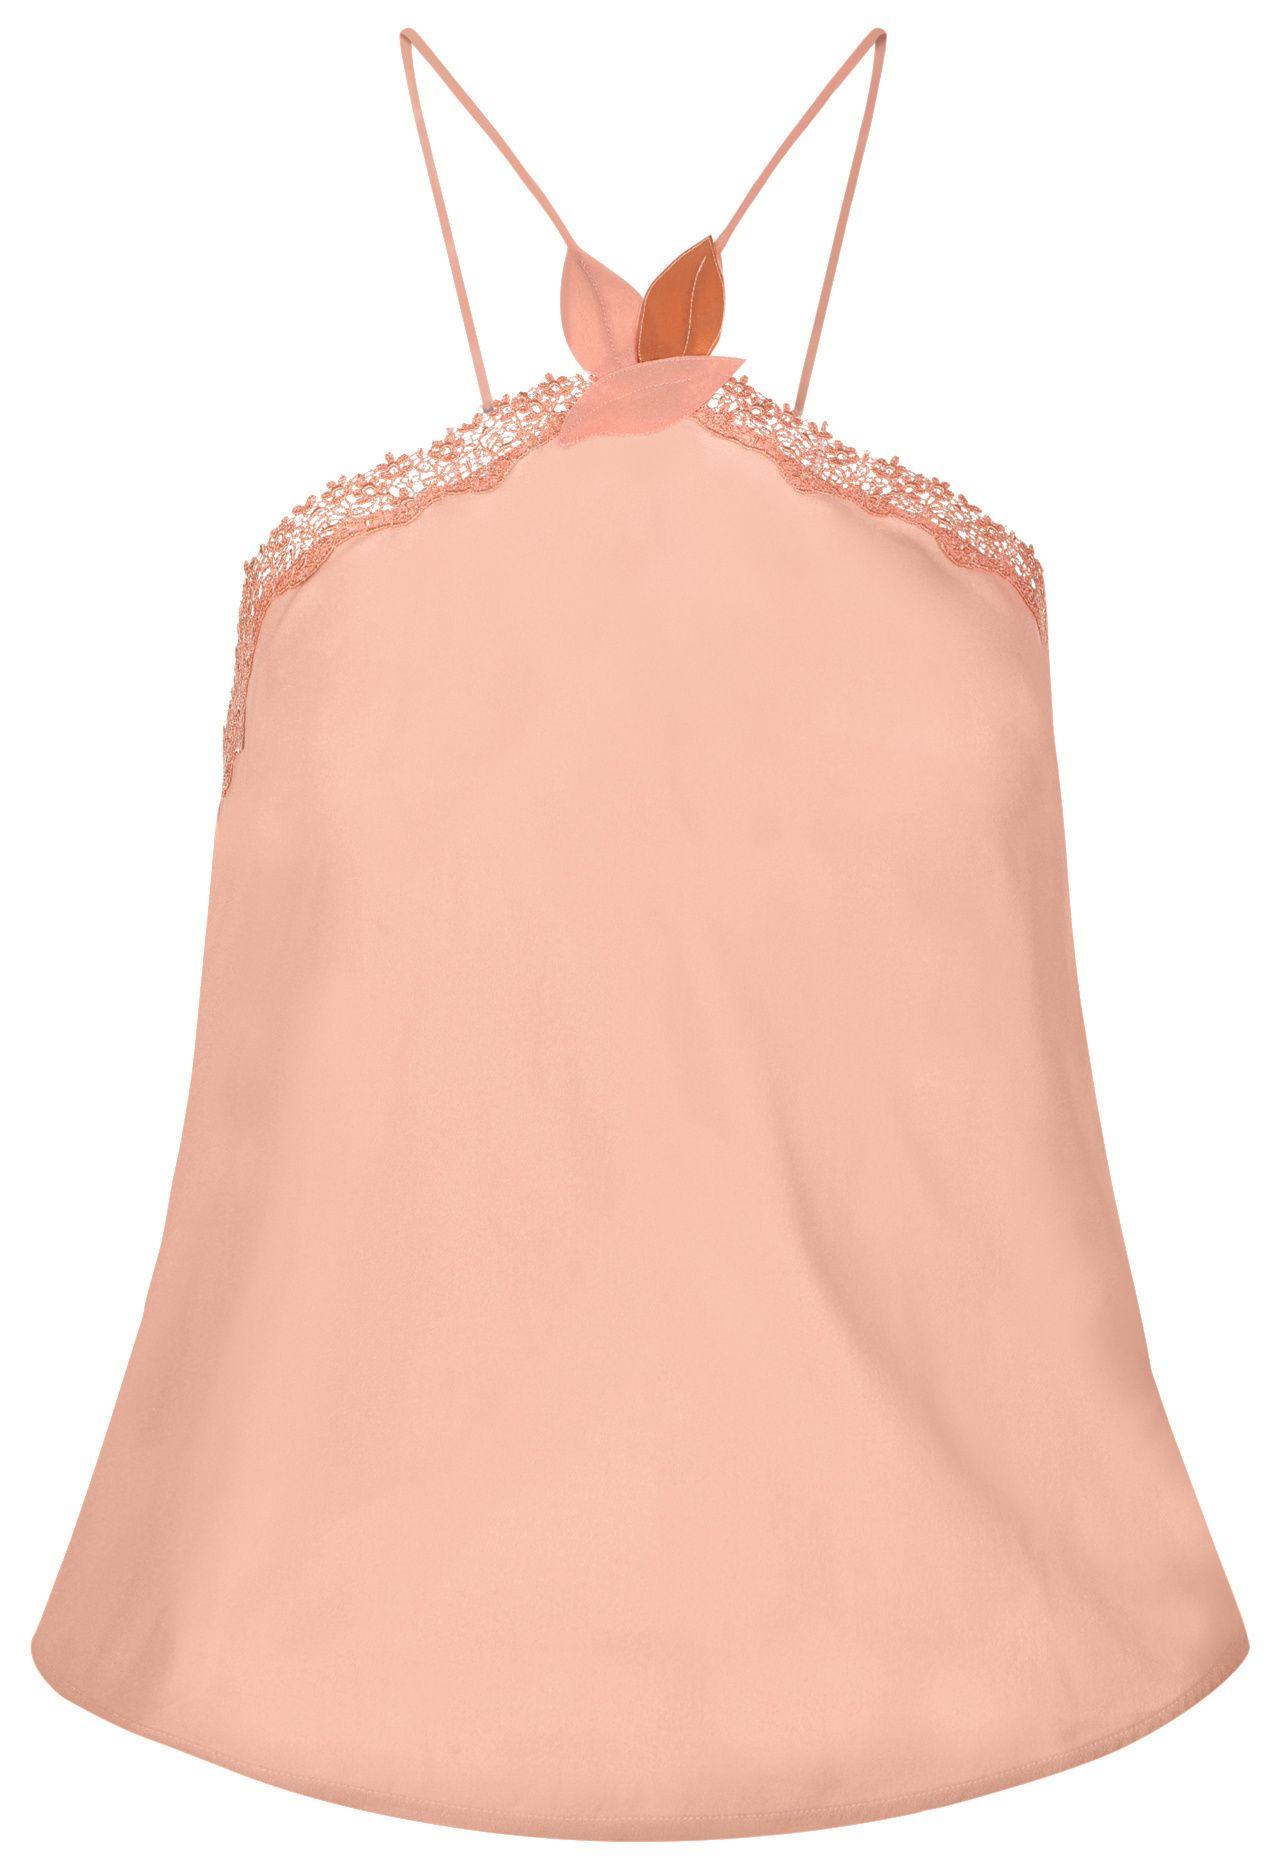 4dd0ebf8d Nude silk georgette halterneck camisole with macramè trim -  CFIPLM0008750 RAG269